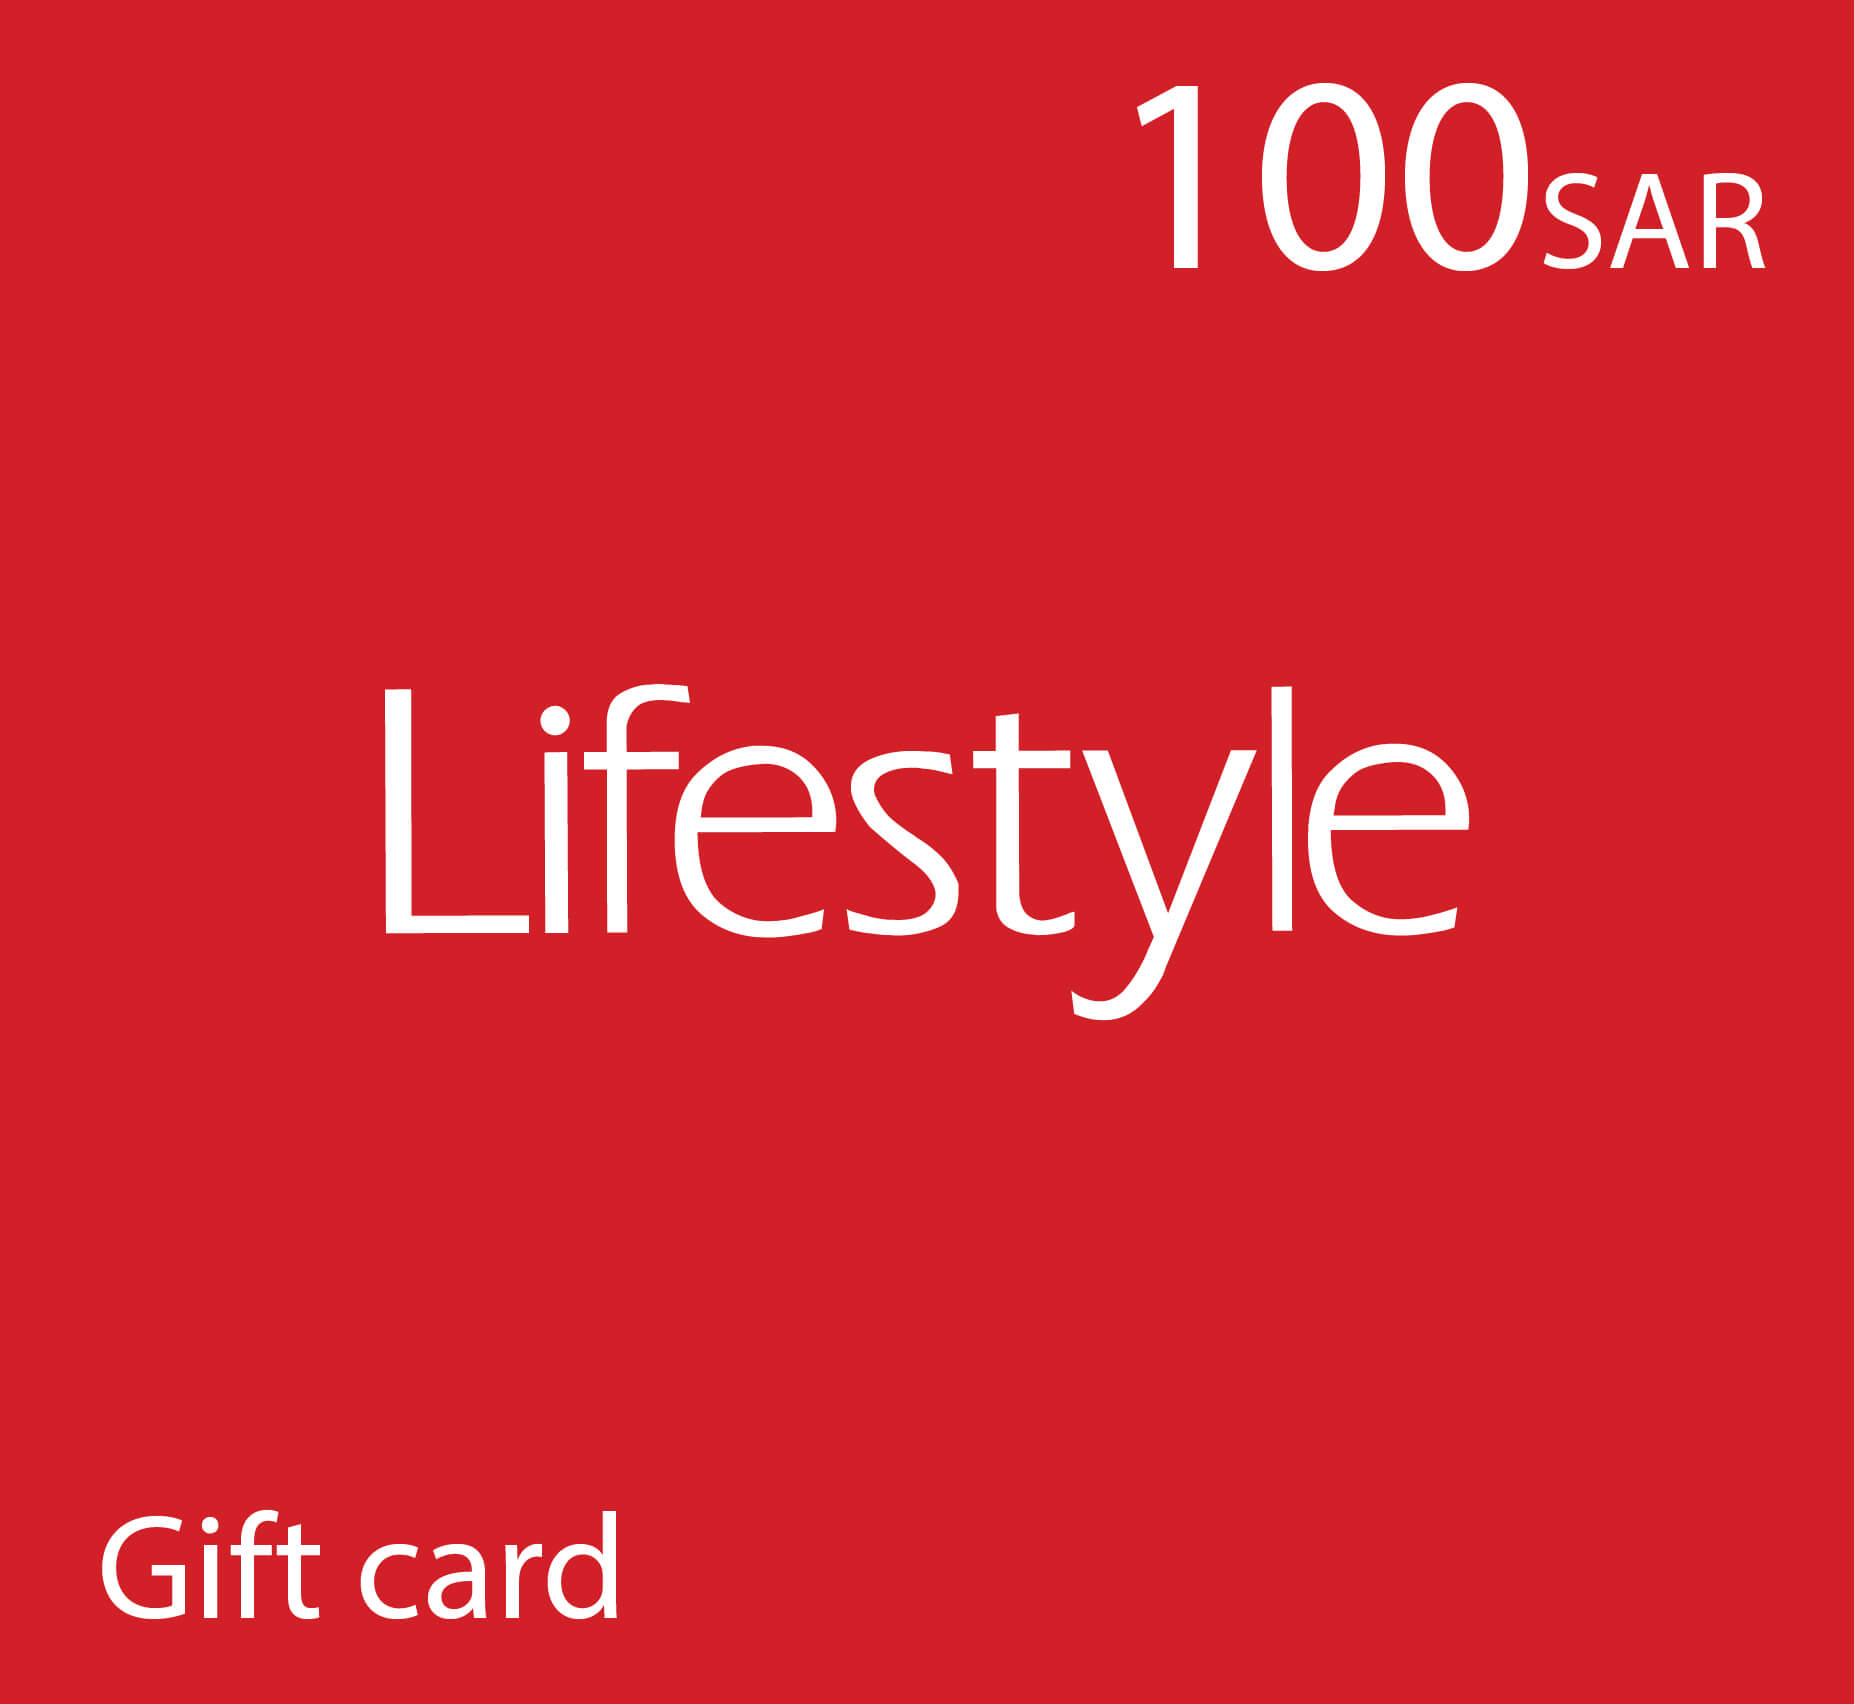 Life Style Gift Card - 100 SAR